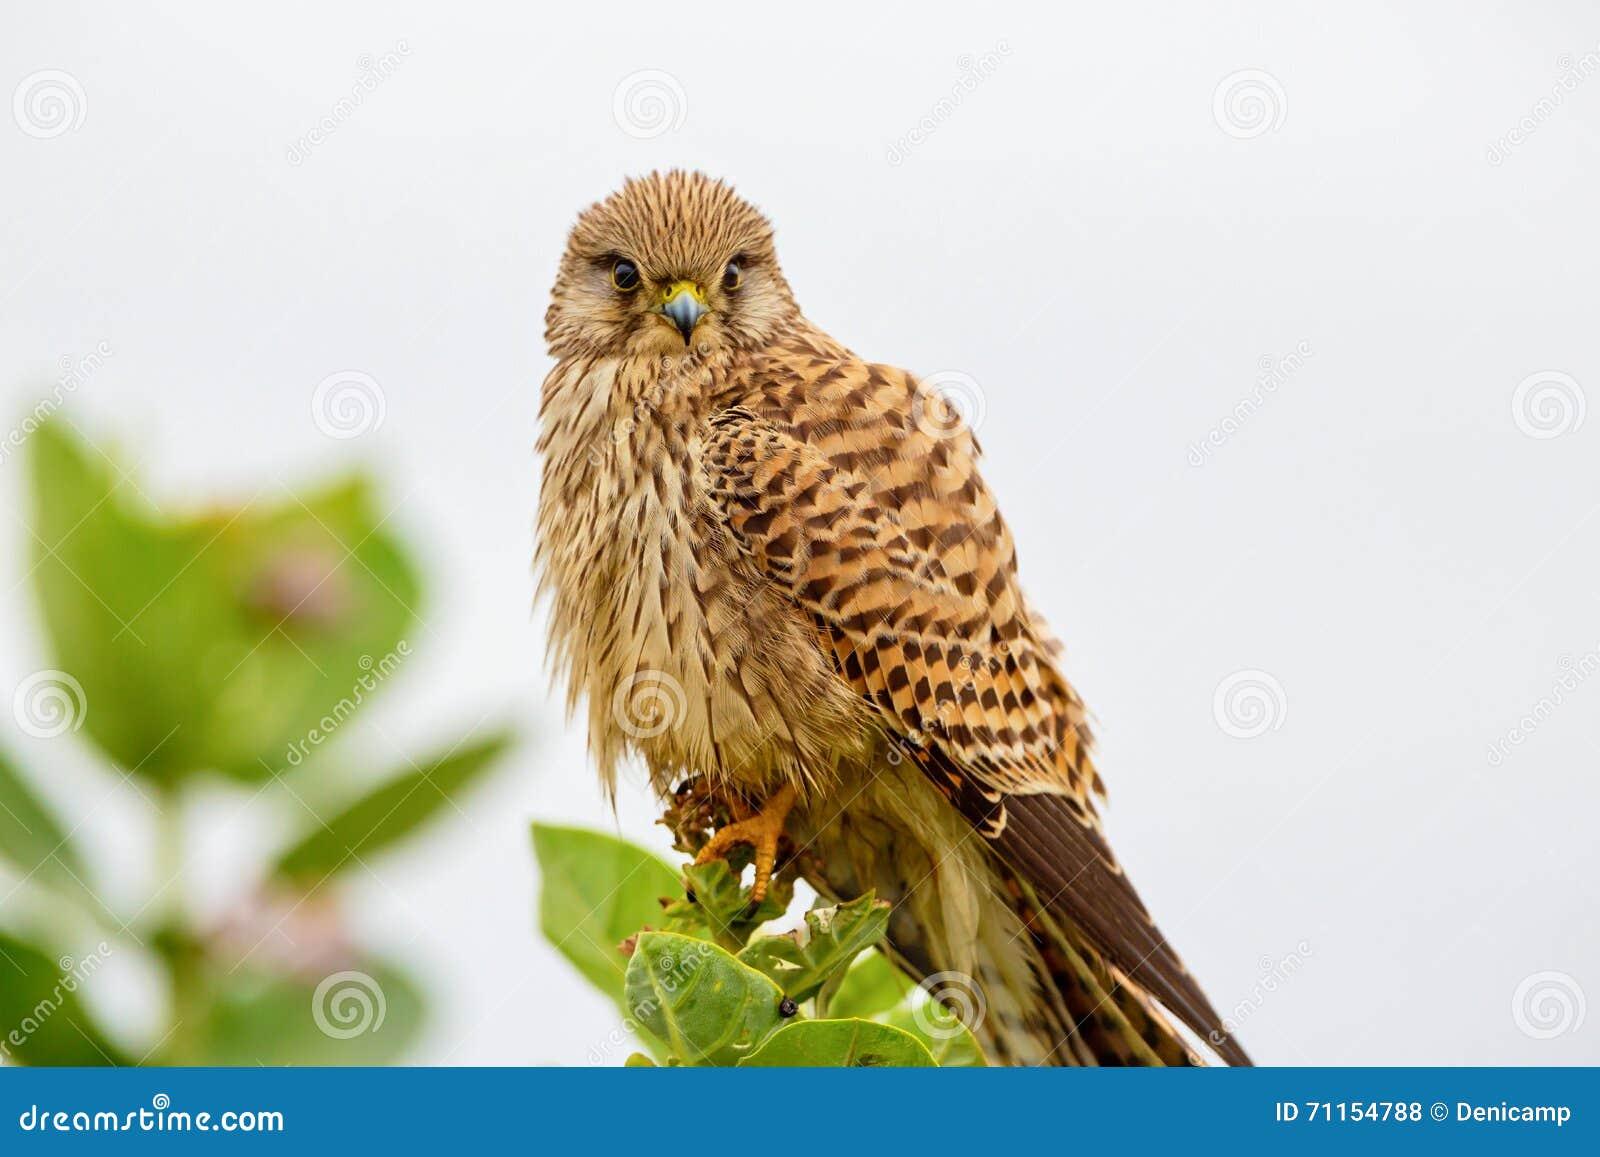 Common Kestral India  stock photo  Image of male, falcon - 71154788